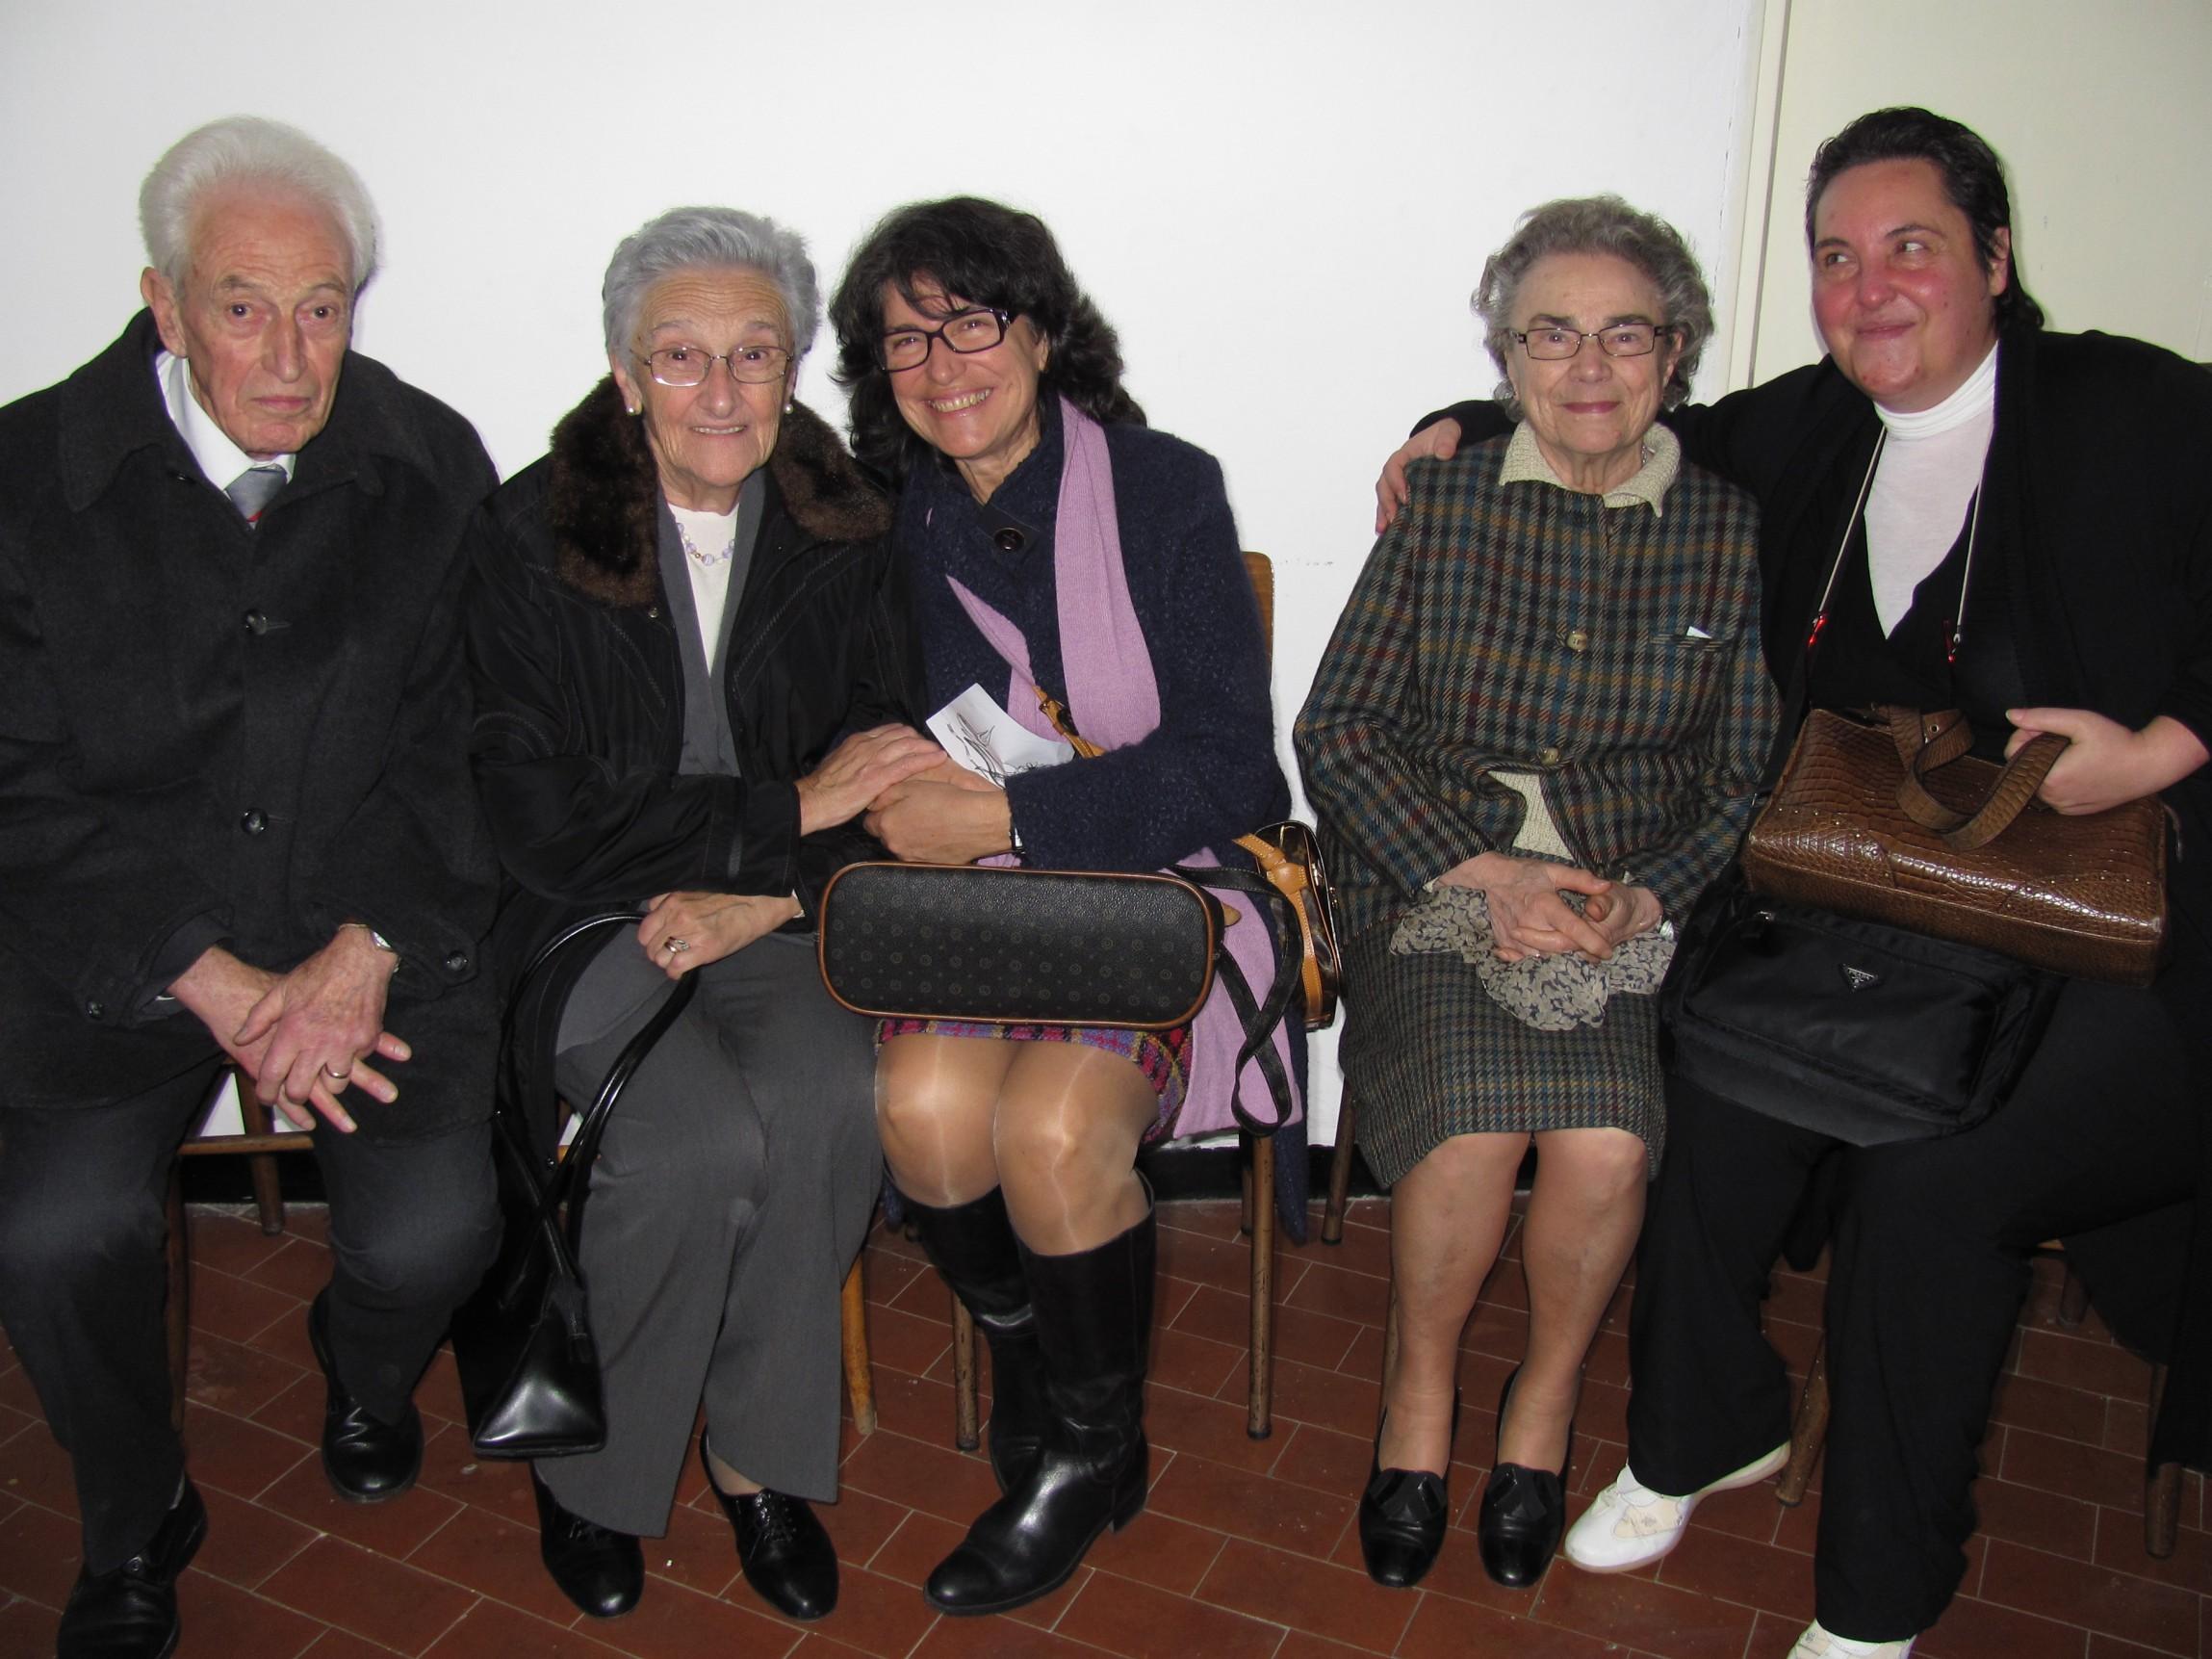 ingresso_giun_spirito_santo_2011-12-11-19-15-39